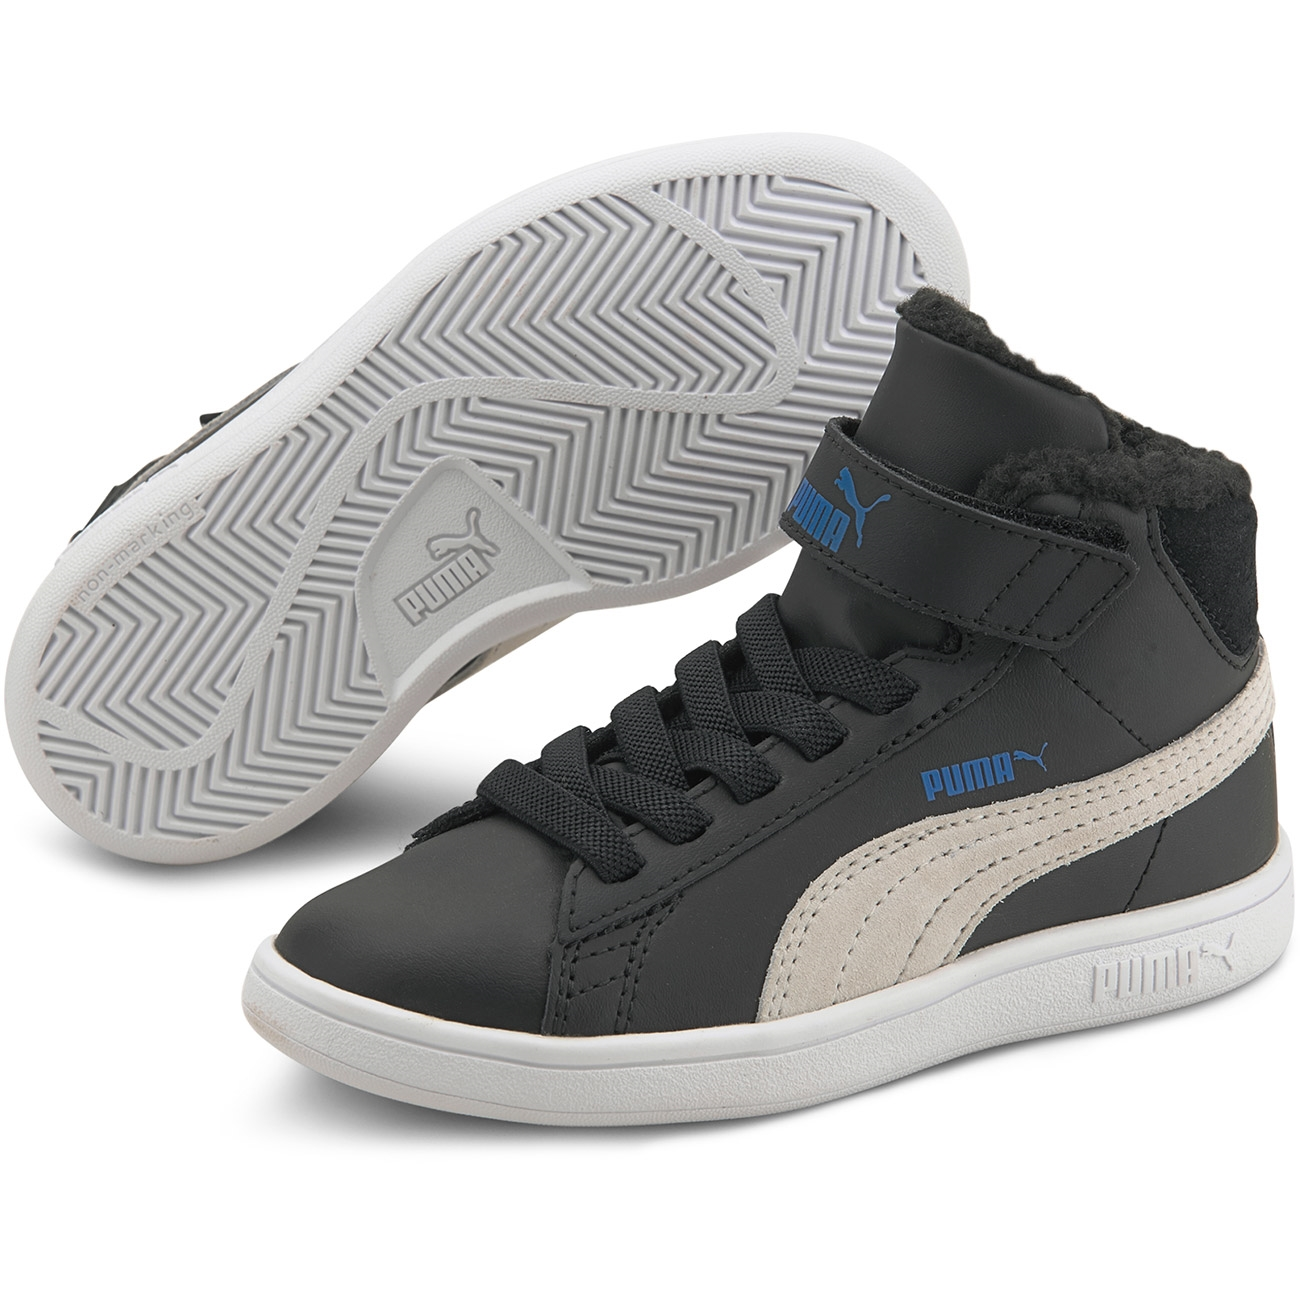 Puma Sneakers Smash v2 Mid Fur Black/White